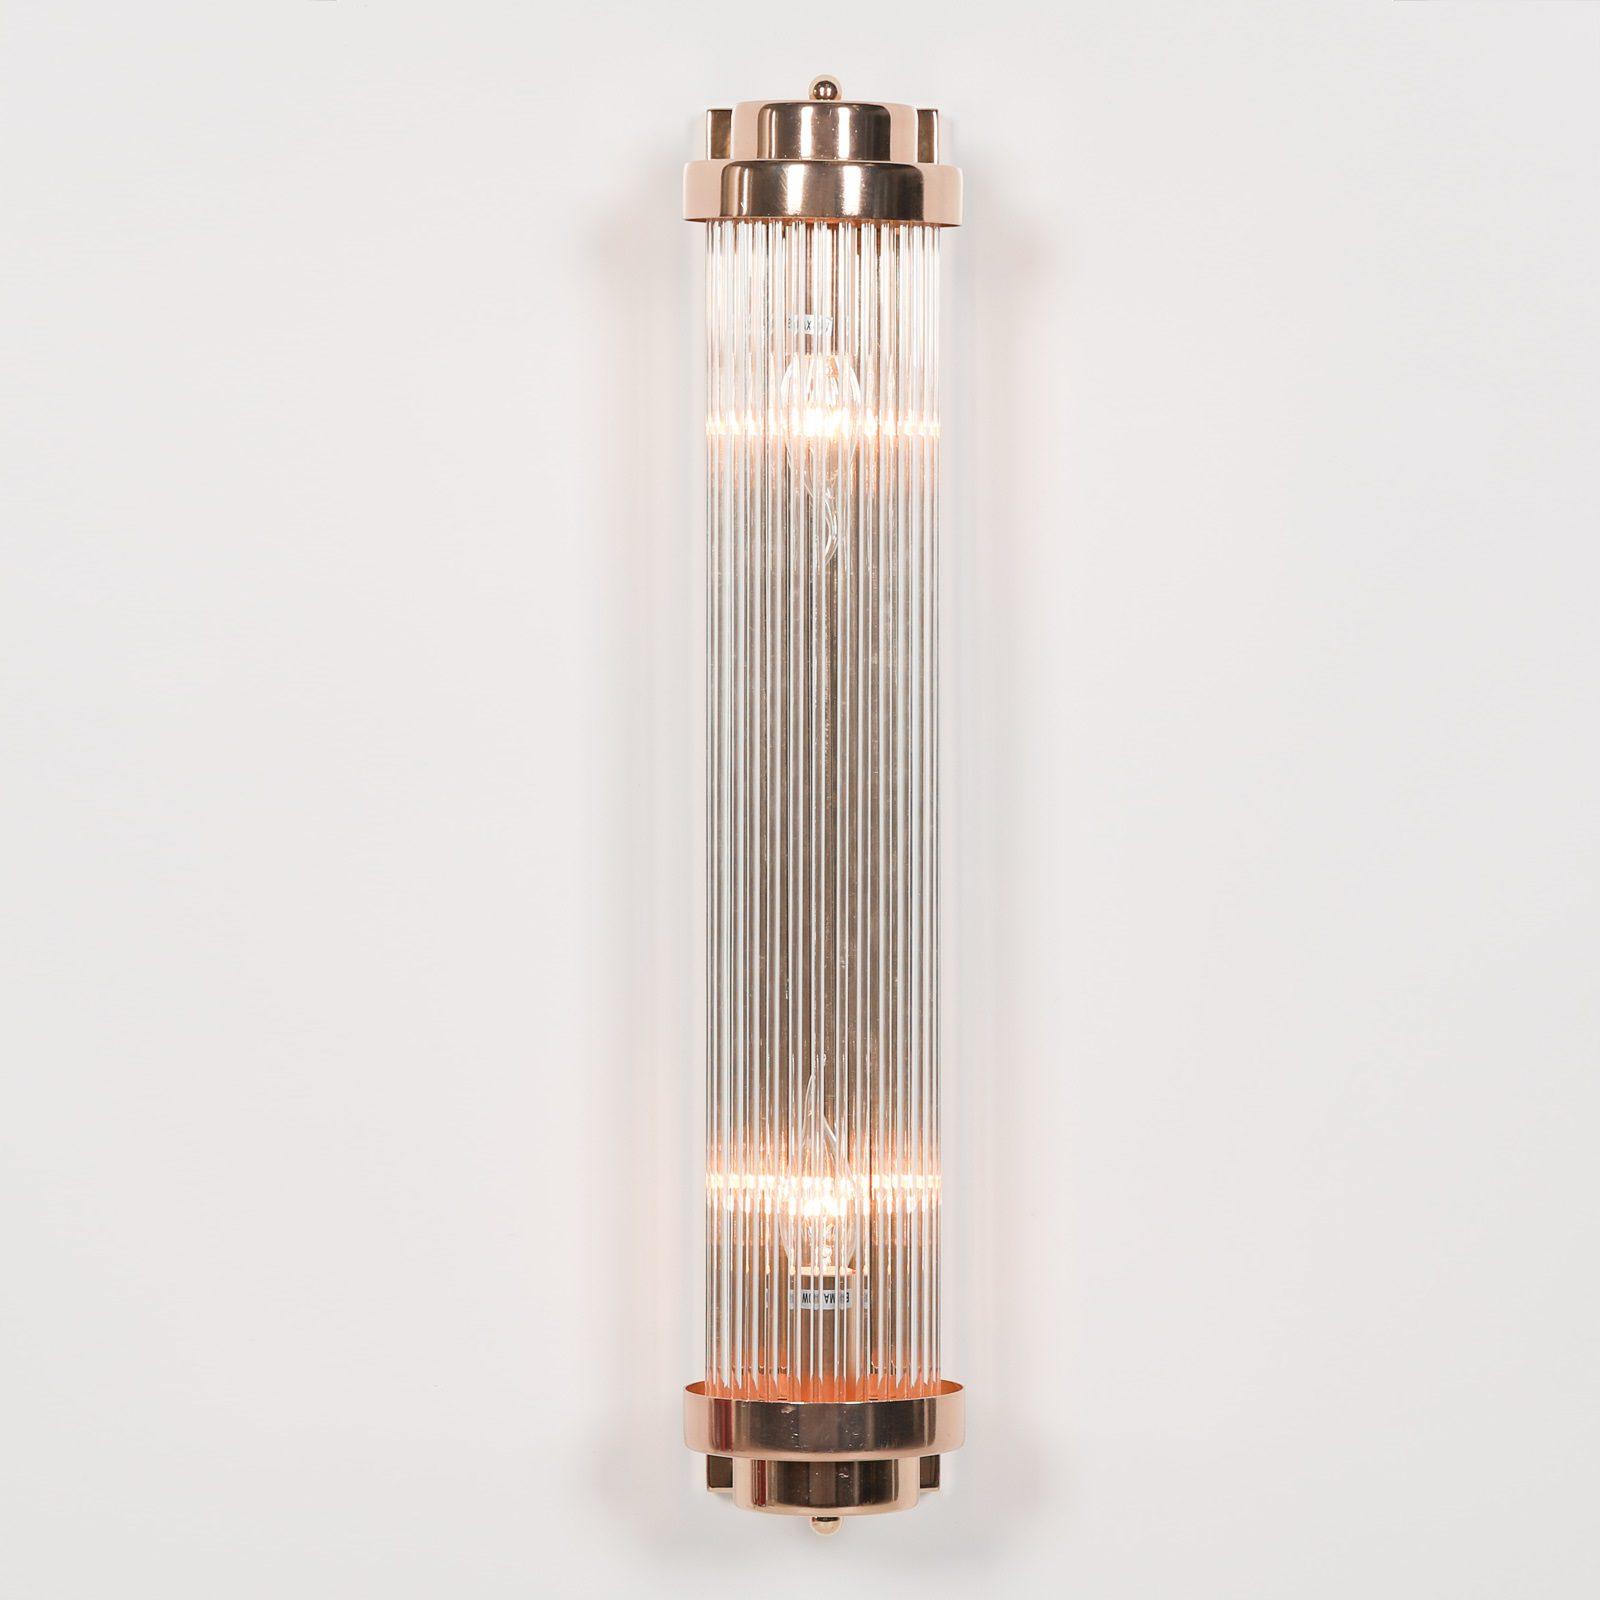 Deco Gold Wall Light 61cm